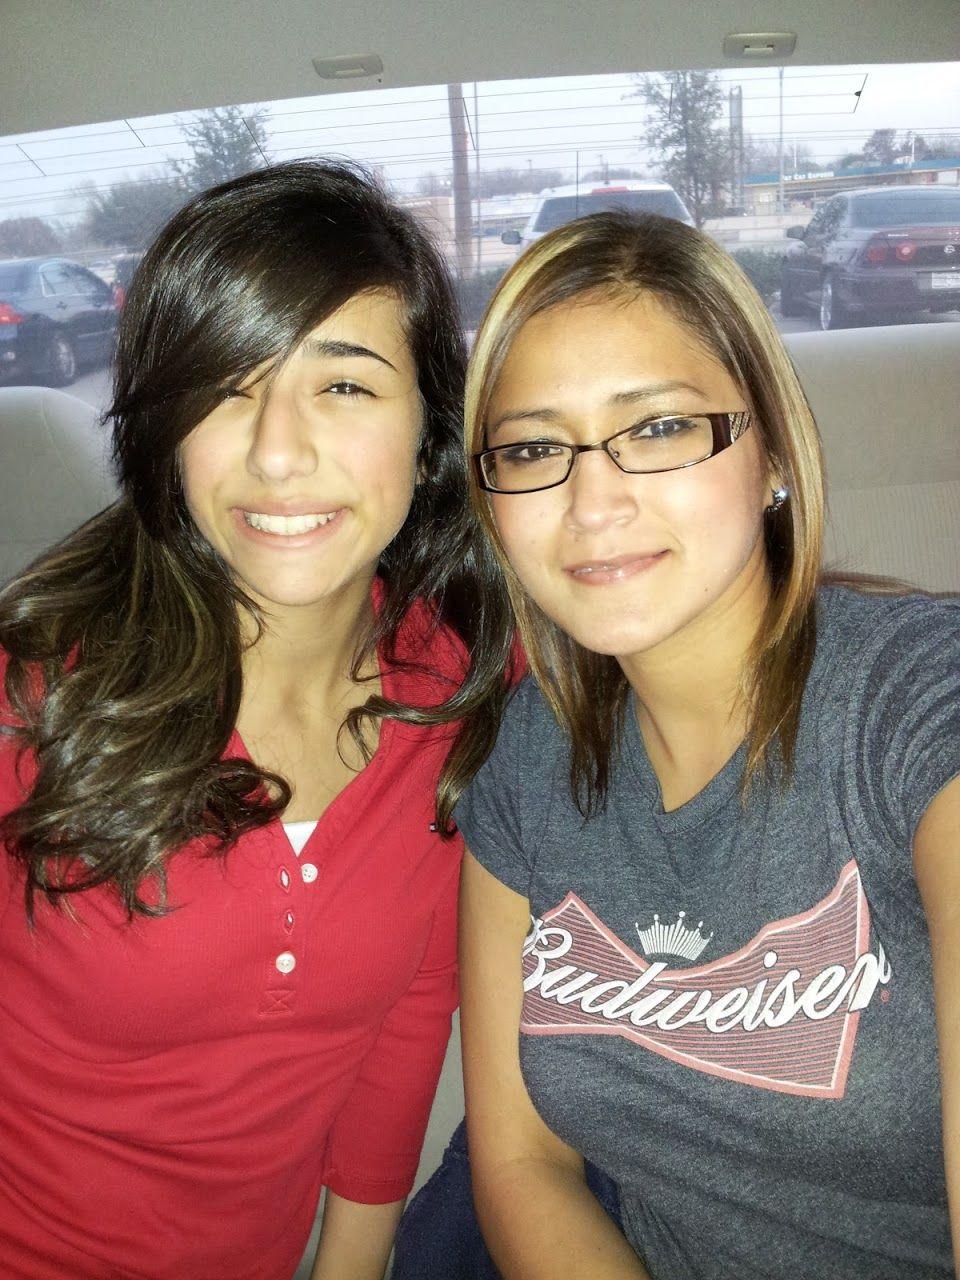 My sis sabrina and I